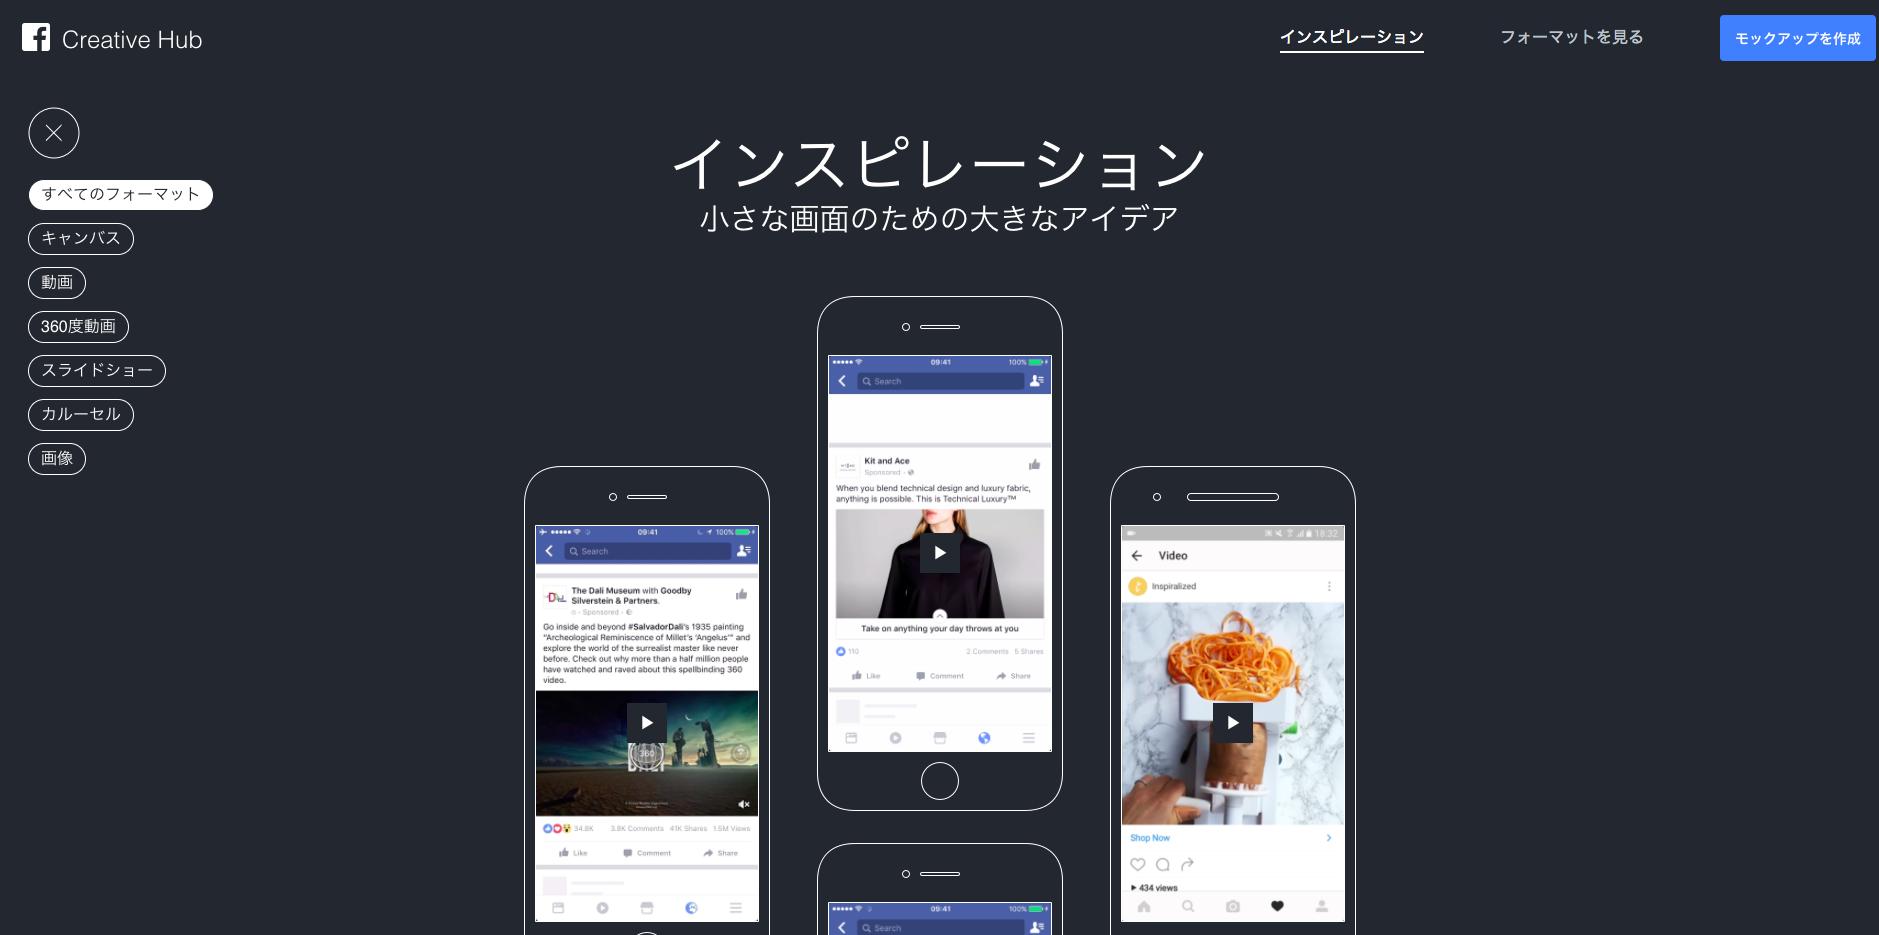 facebook_creative-hub_inspiration